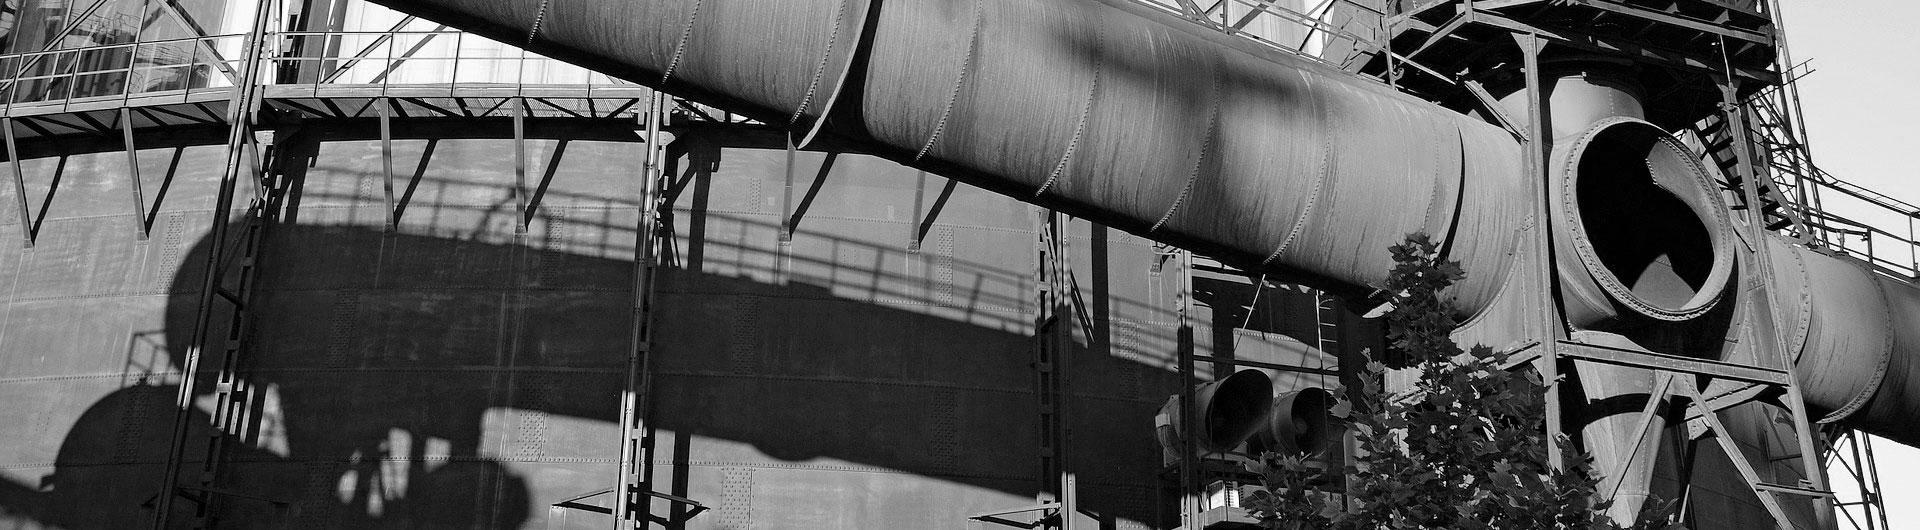 casos exito siderurgia